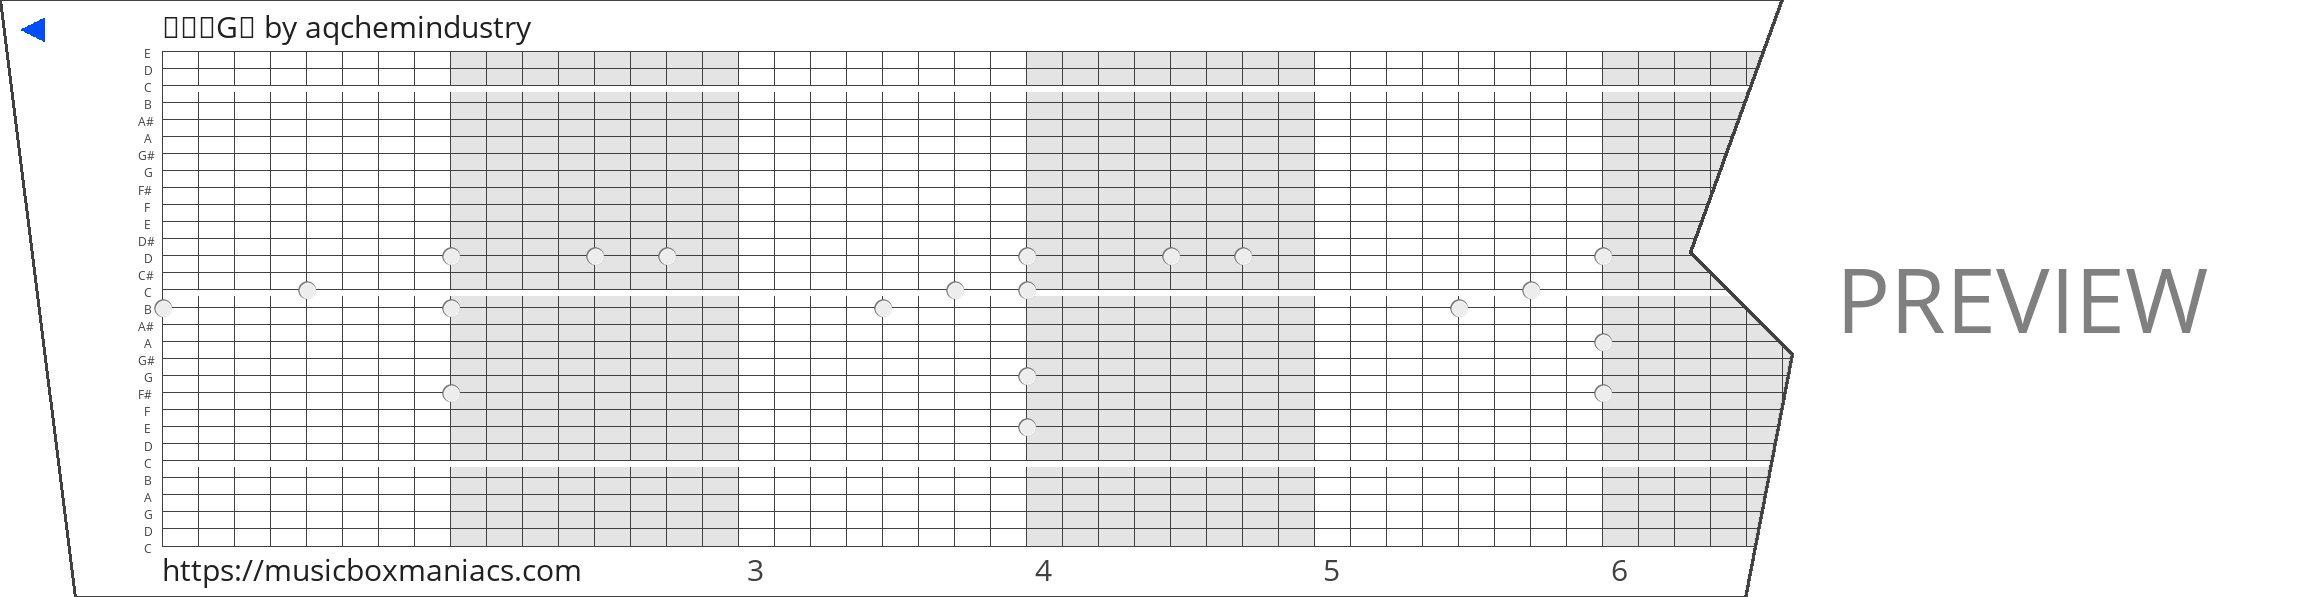 滑滑蛋G调 30 note music box paper strip